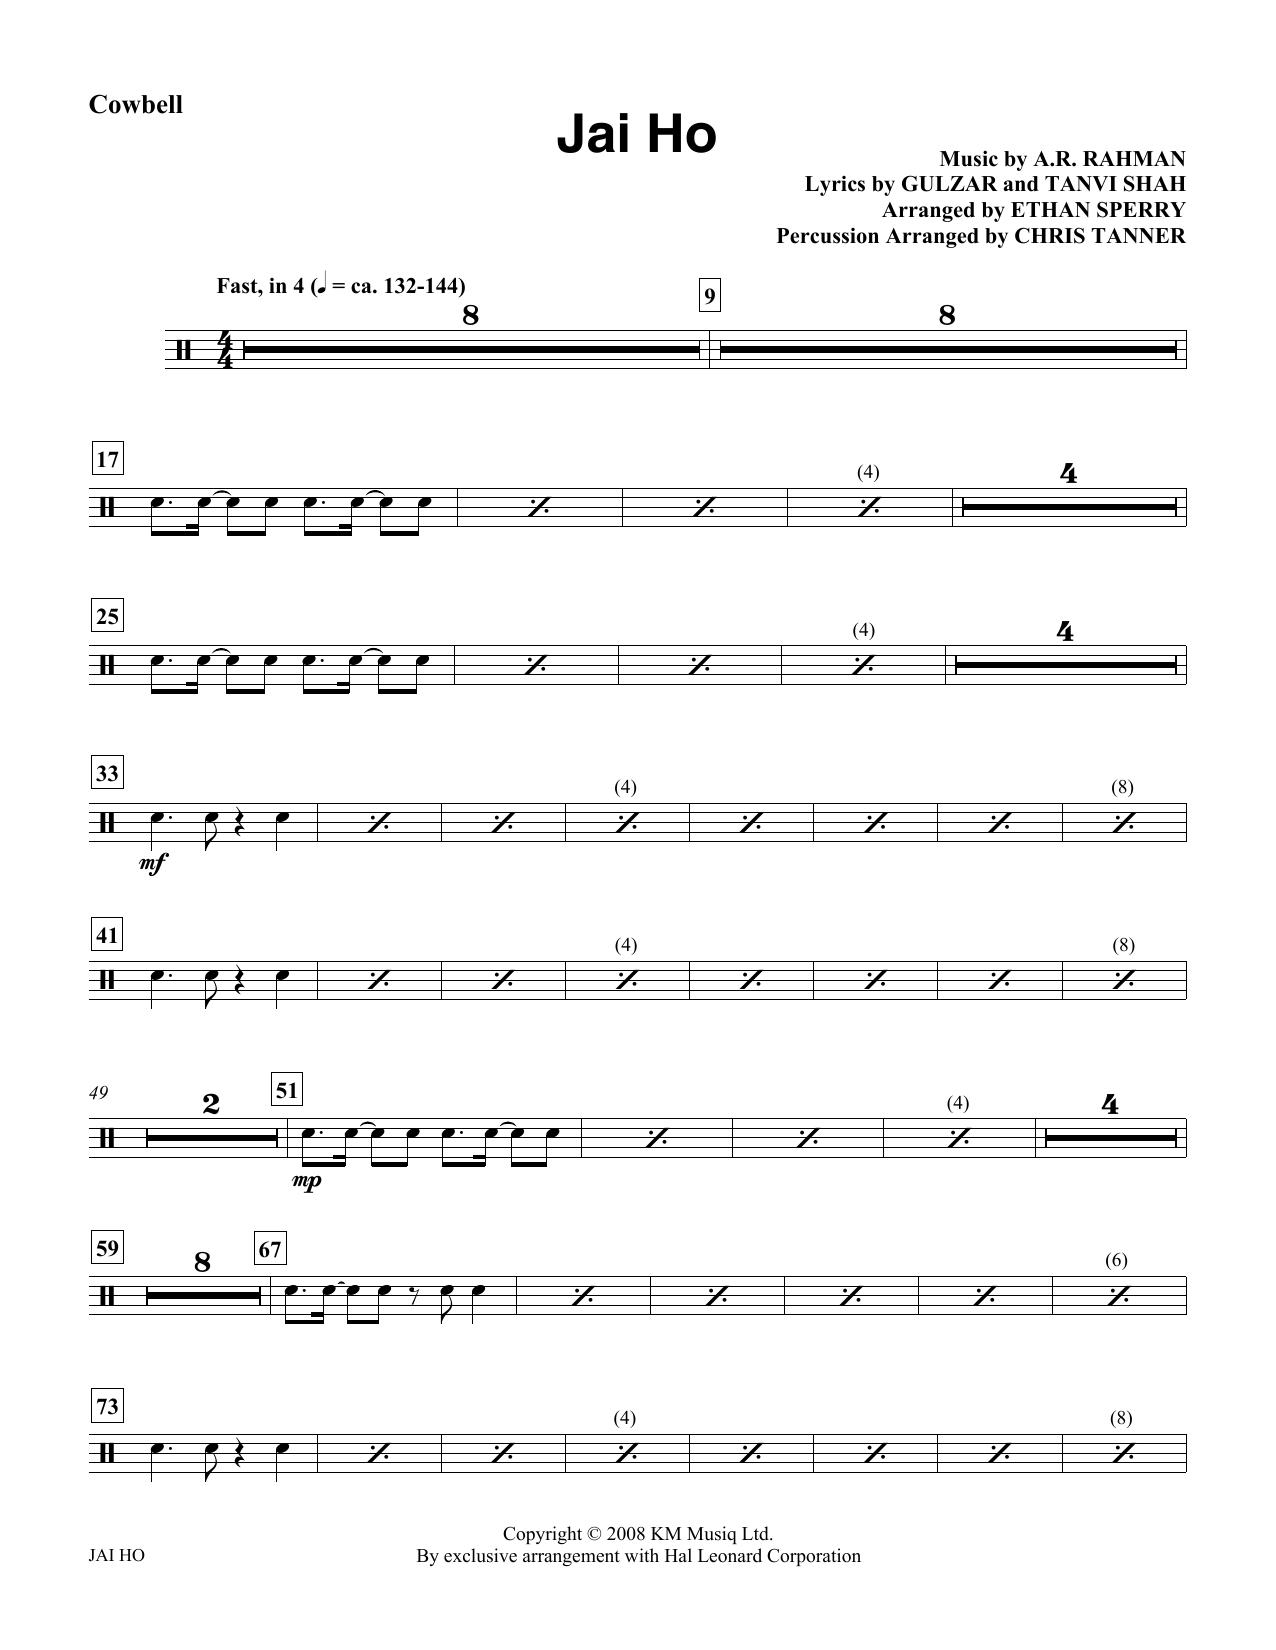 Jai Ho - Cowbell Sheet Music